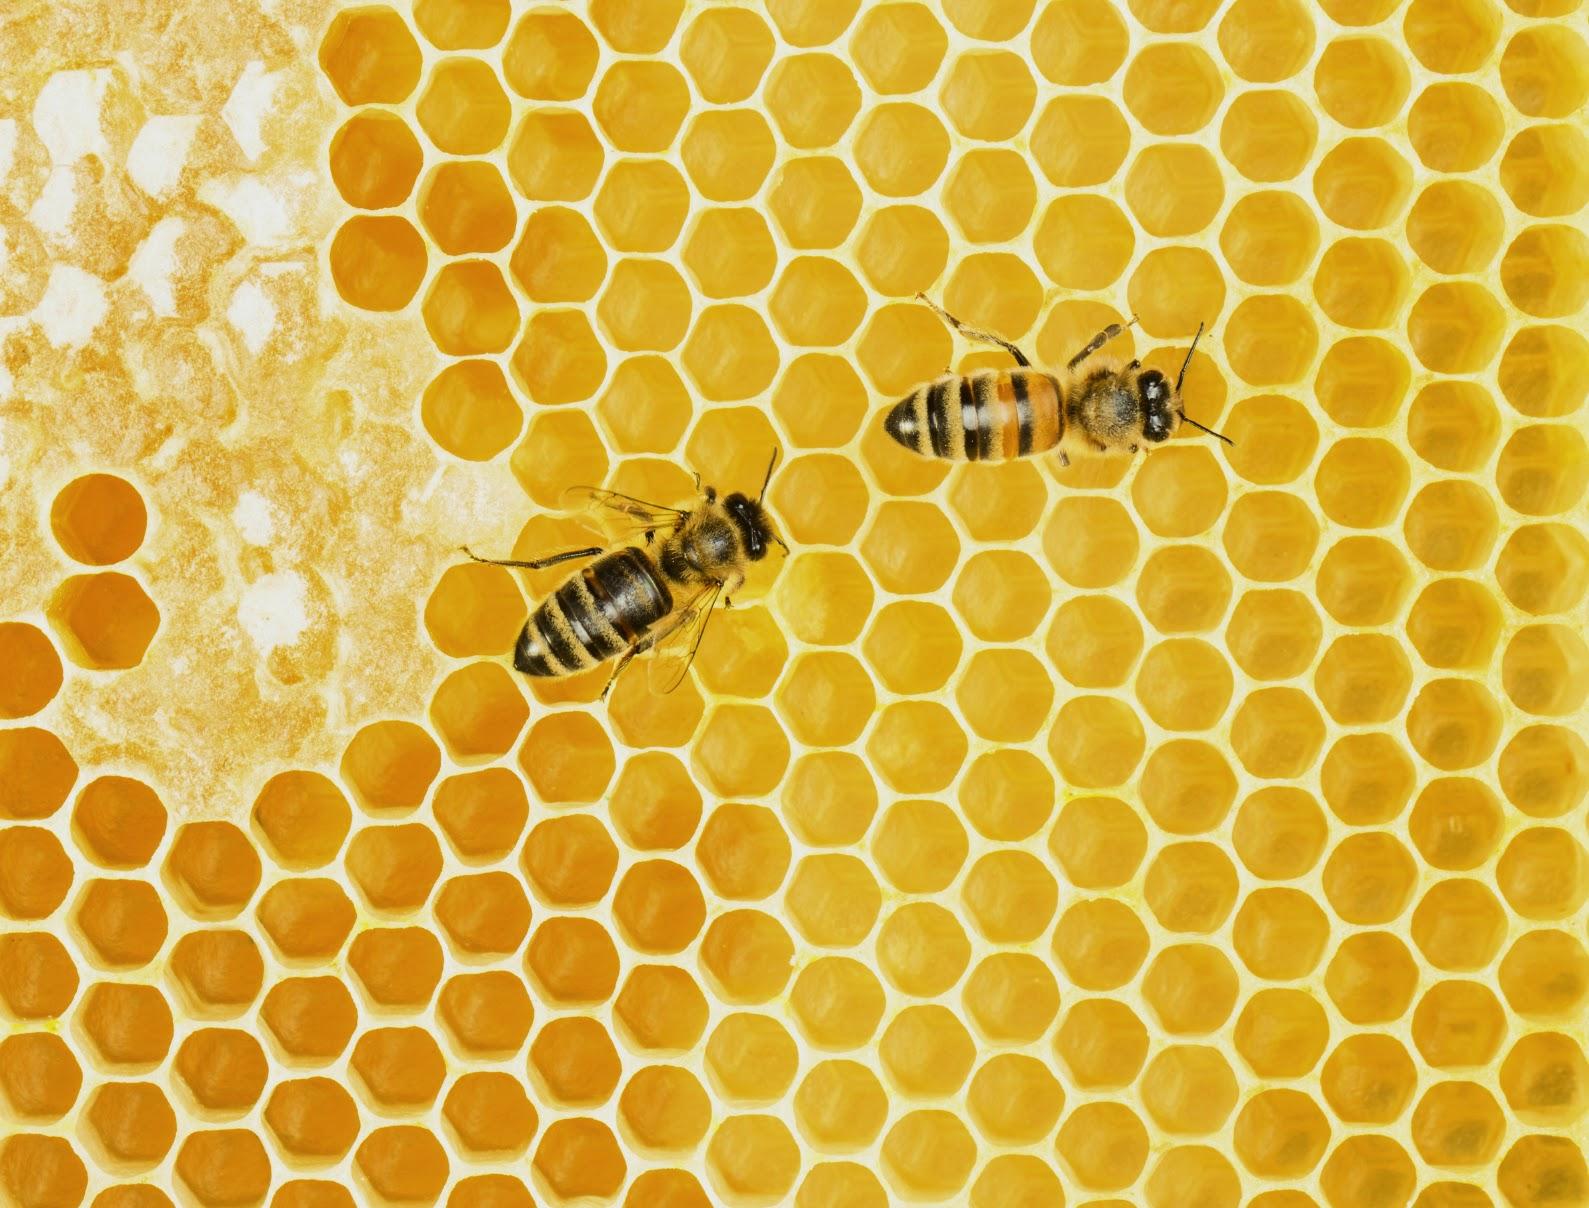 beekeeping for beginners beekeeping supplies you need to get